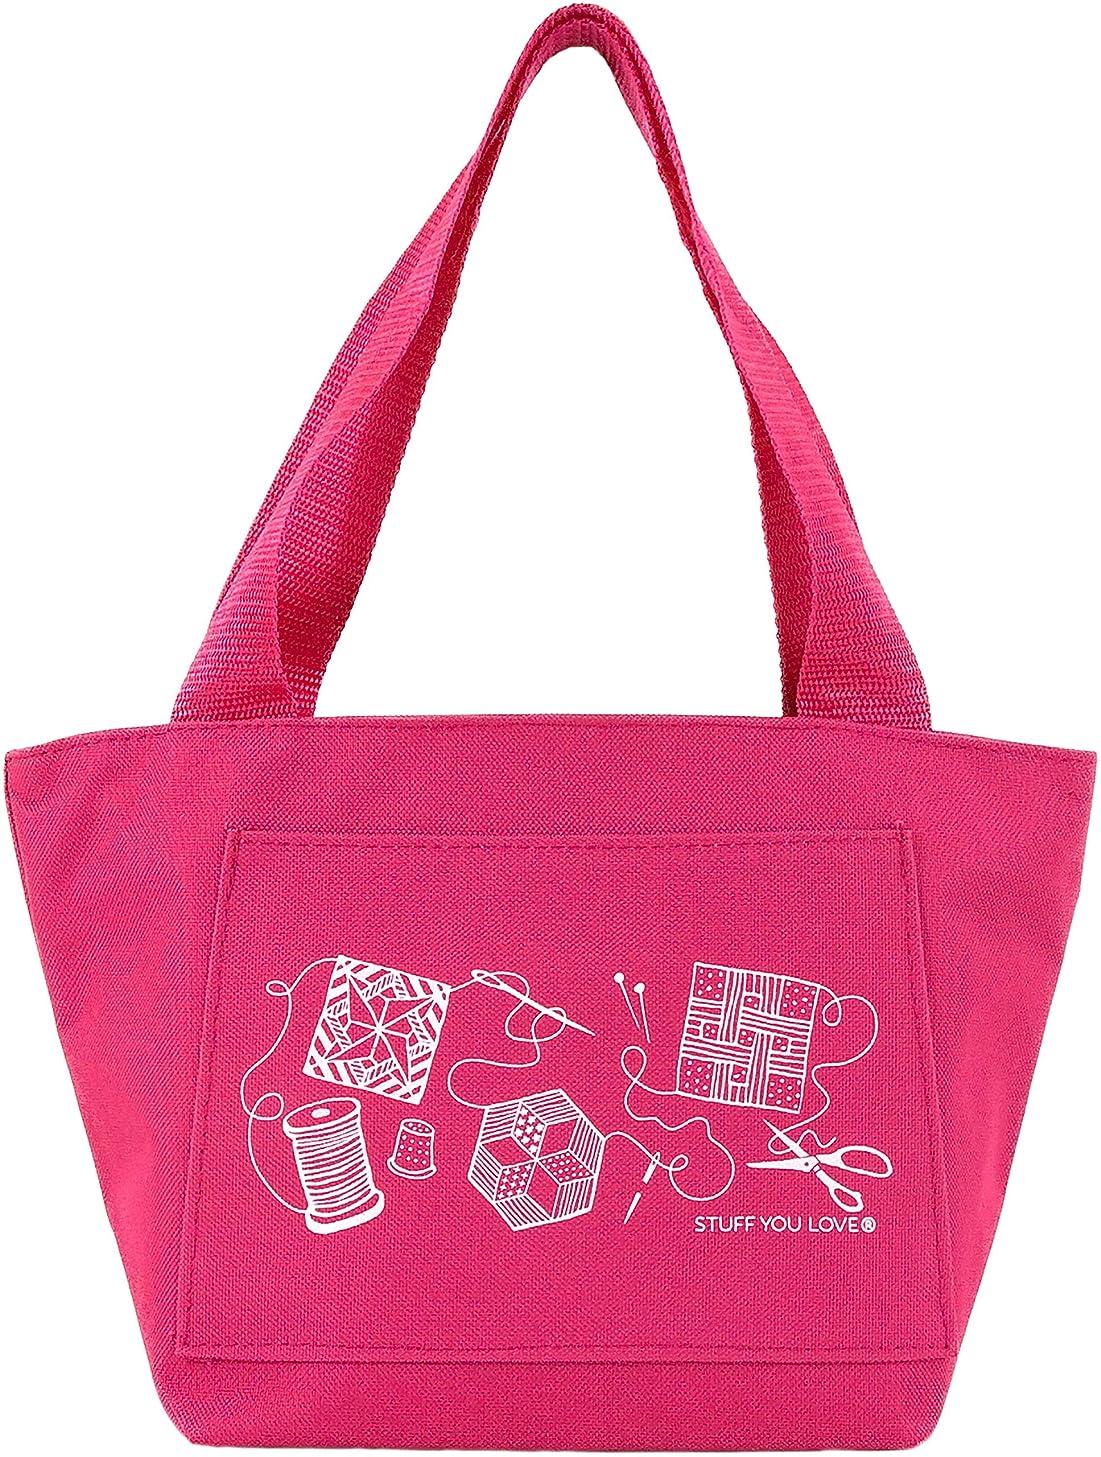 Quilt Happy Petite Project Bag, Hot Pink